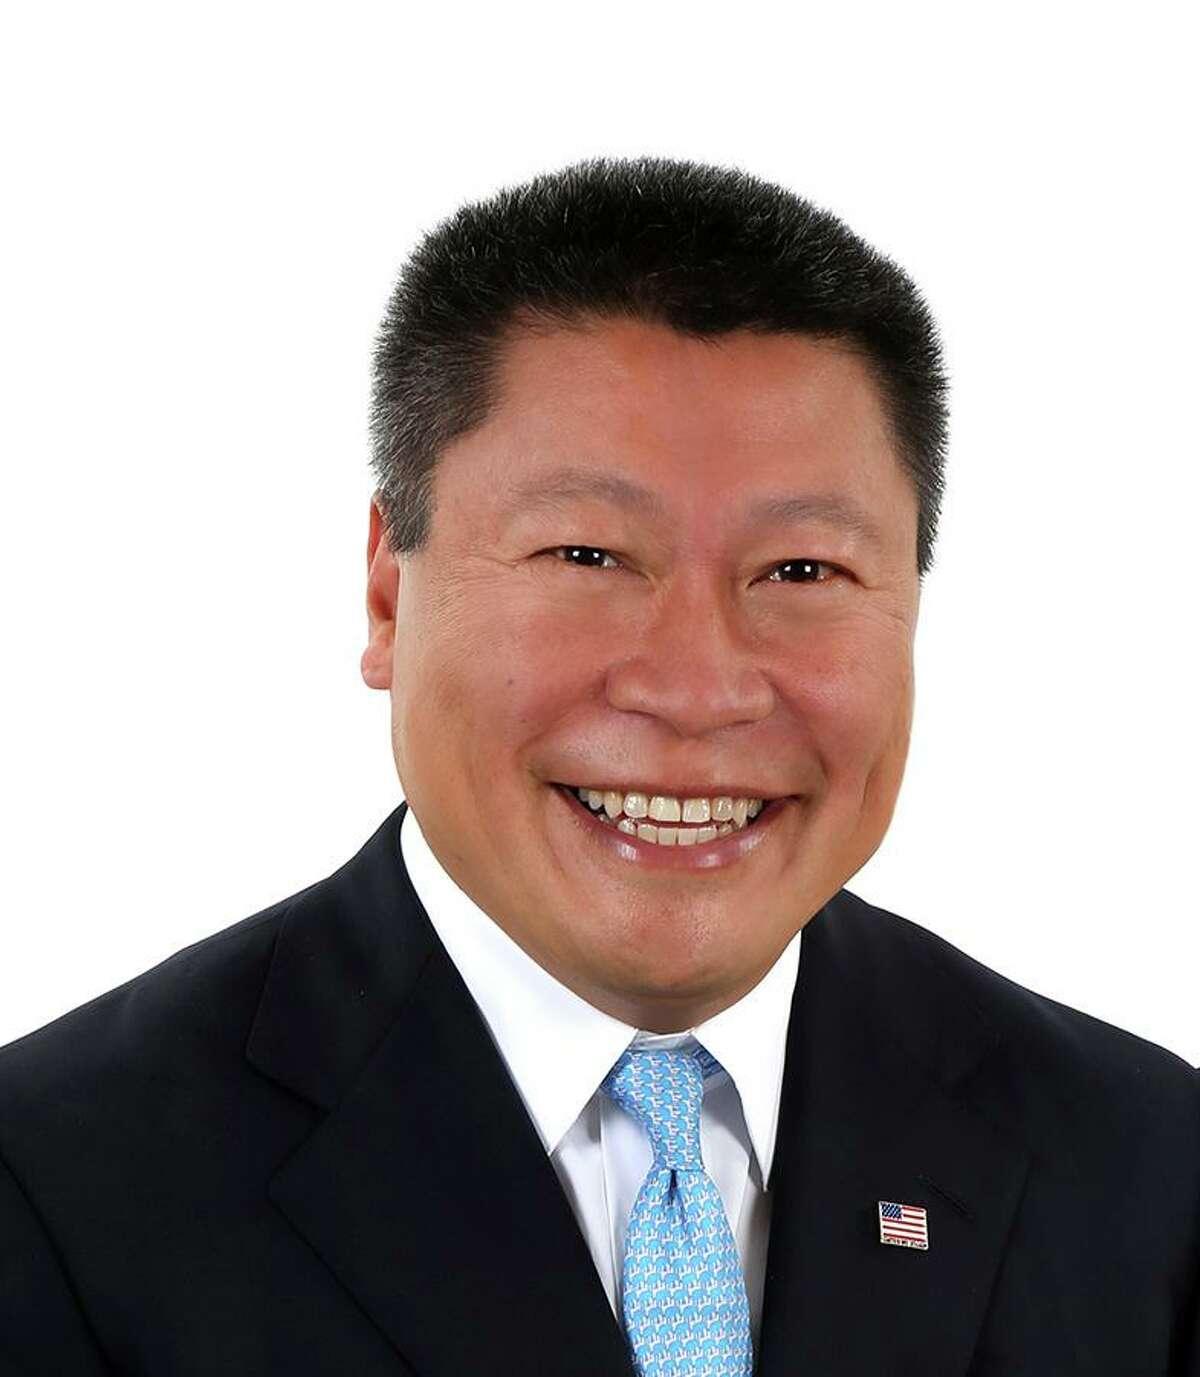 State Sen. Tony Hwang, R-District 28